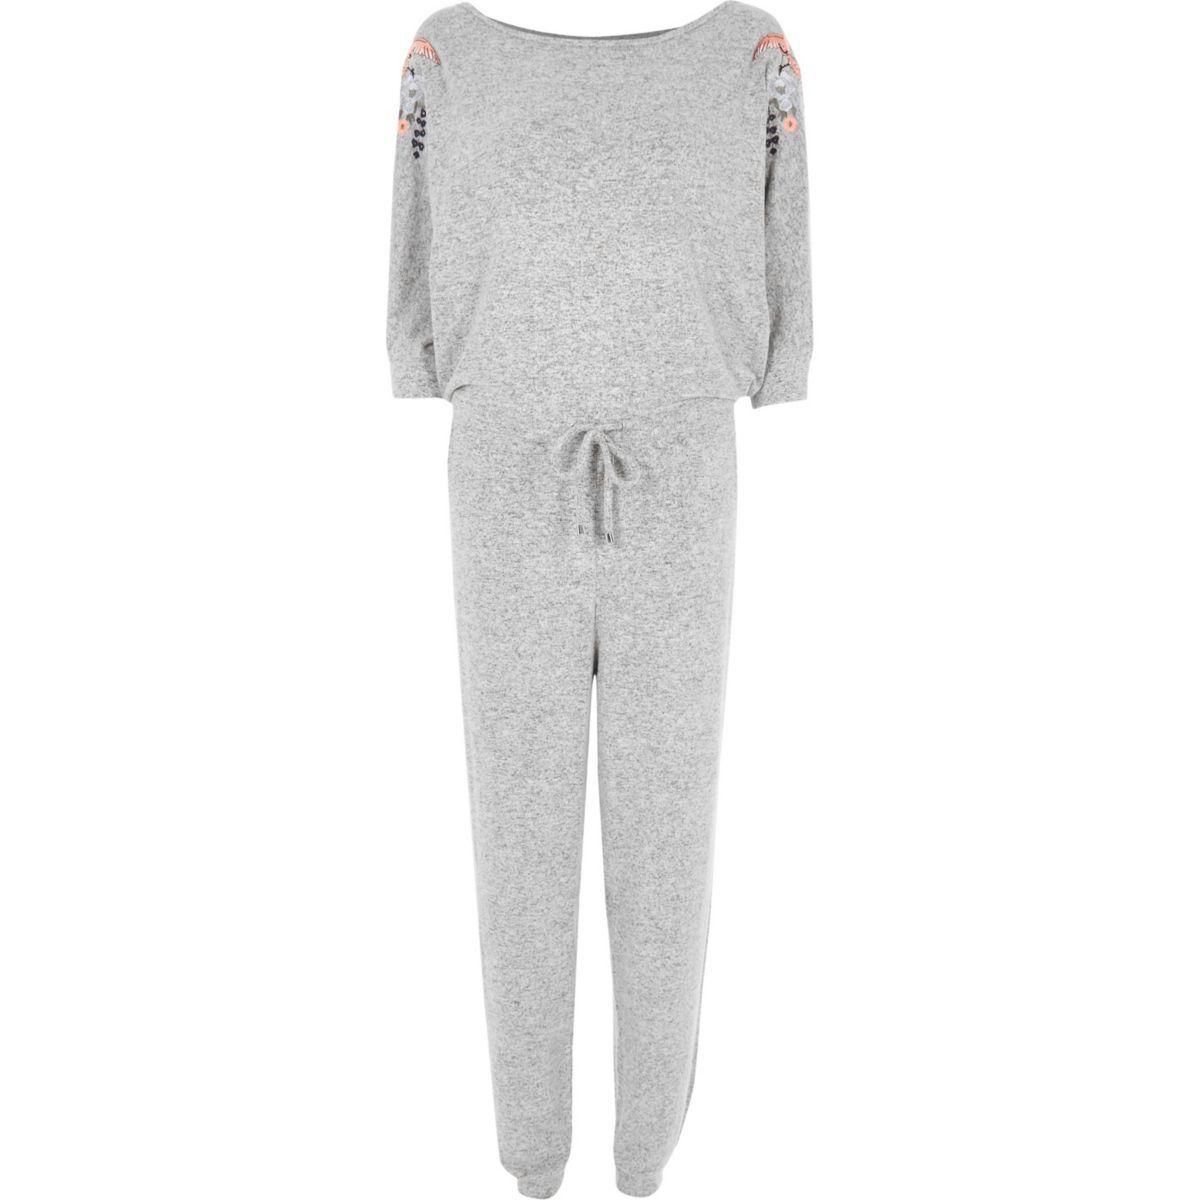 Light grey floral embroidered jumpsuit